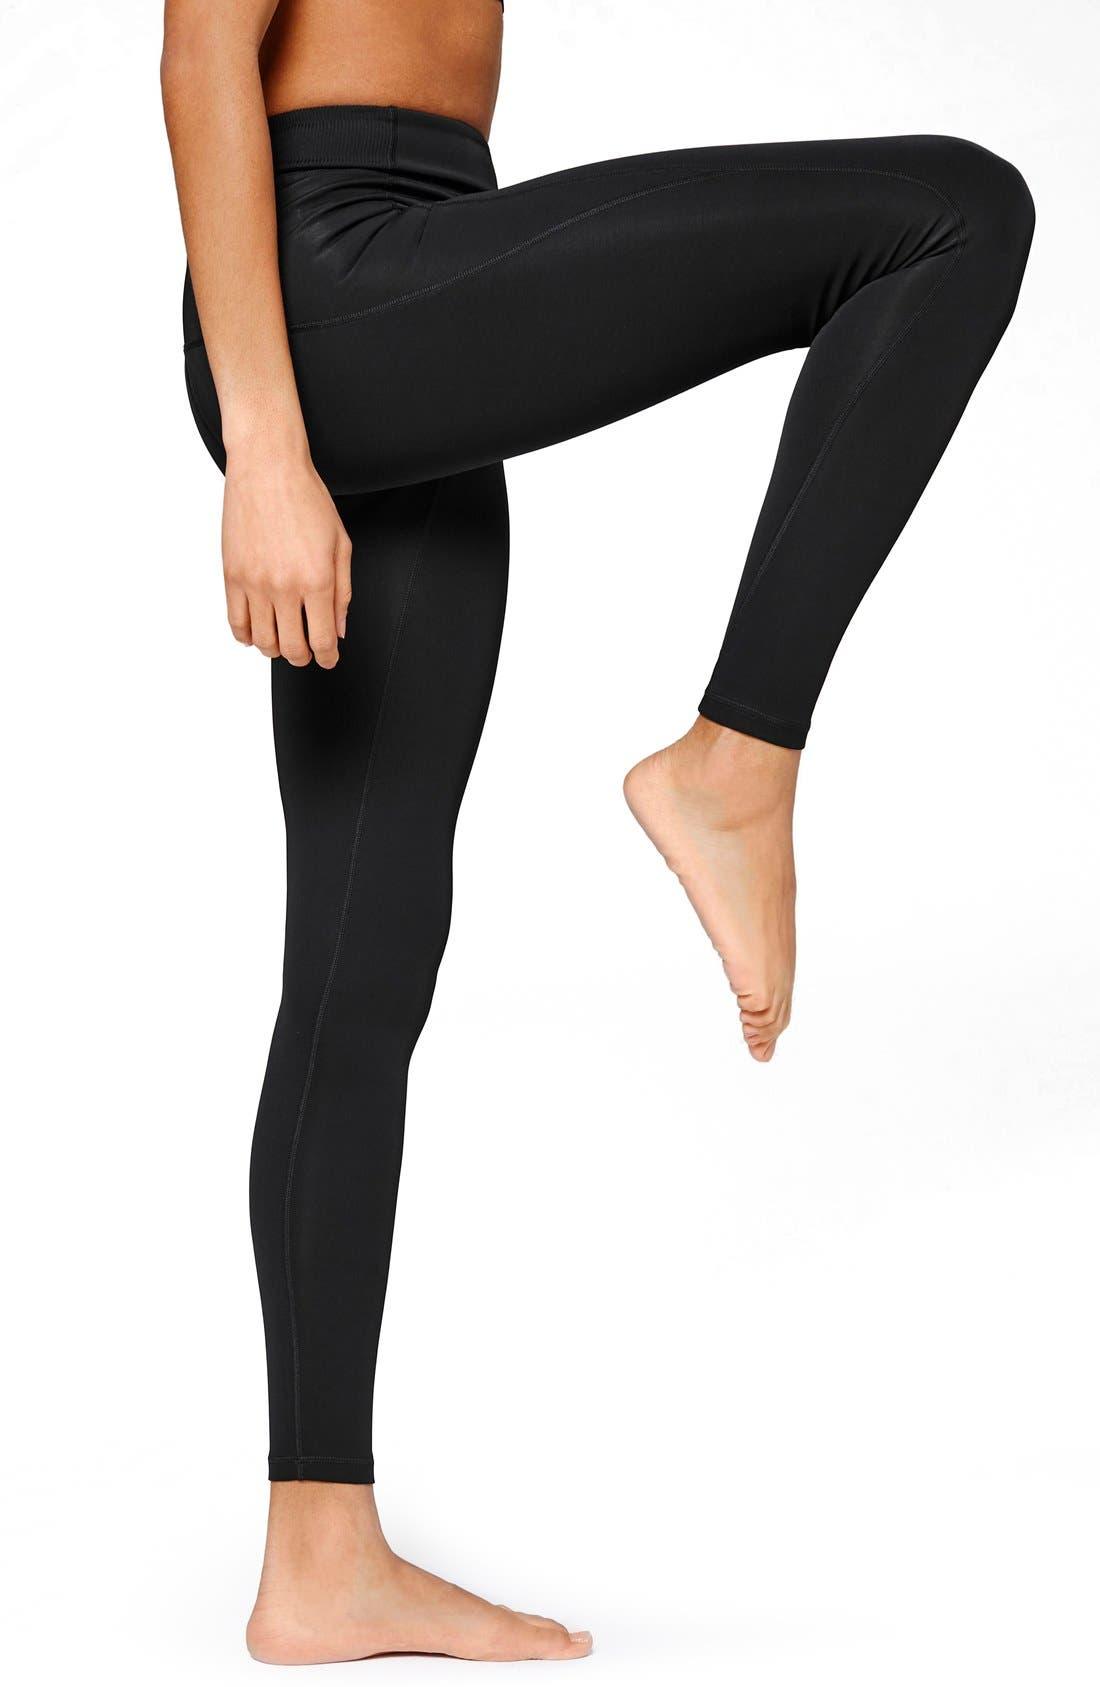 Alternate Image 1 Selected - IVY PARK® 'Y' High Rise Leggings